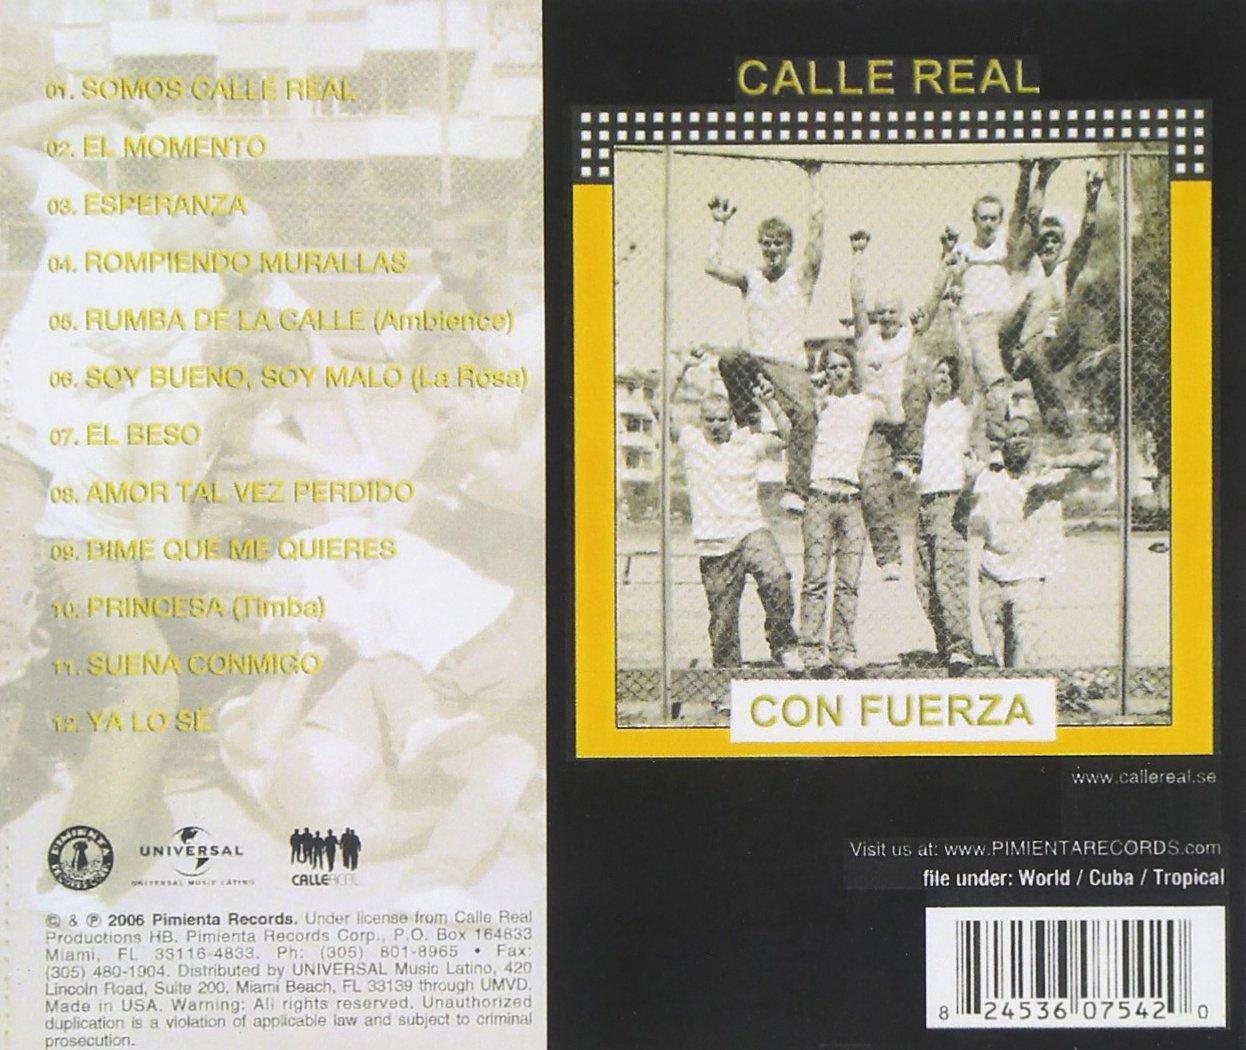 Calle Real Con Fuerz: Calle Real: Amazon.es: Música